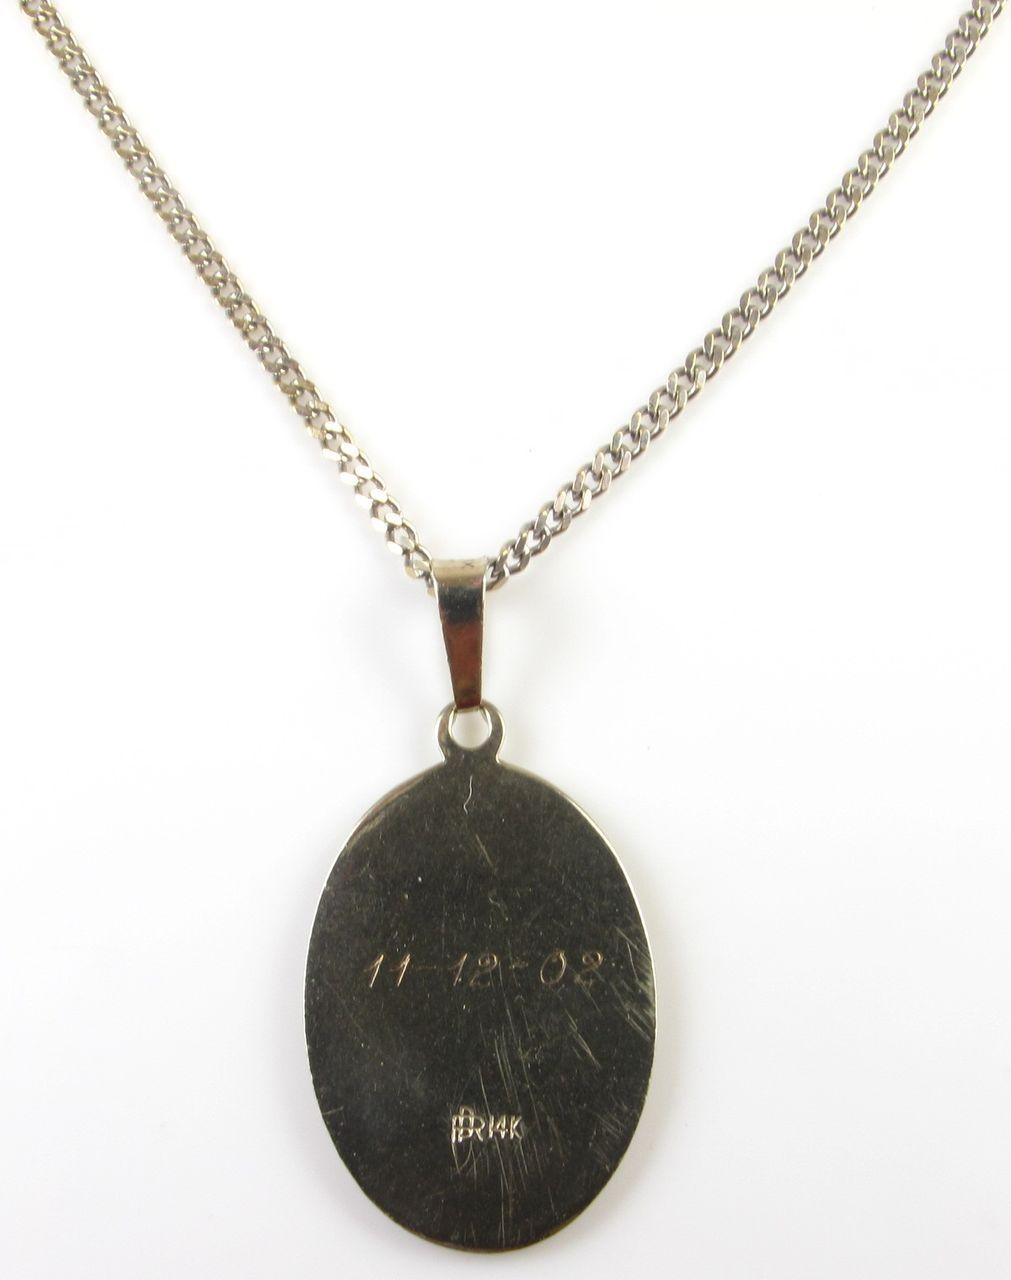 vintage 14k white gold christopher pendant on curb